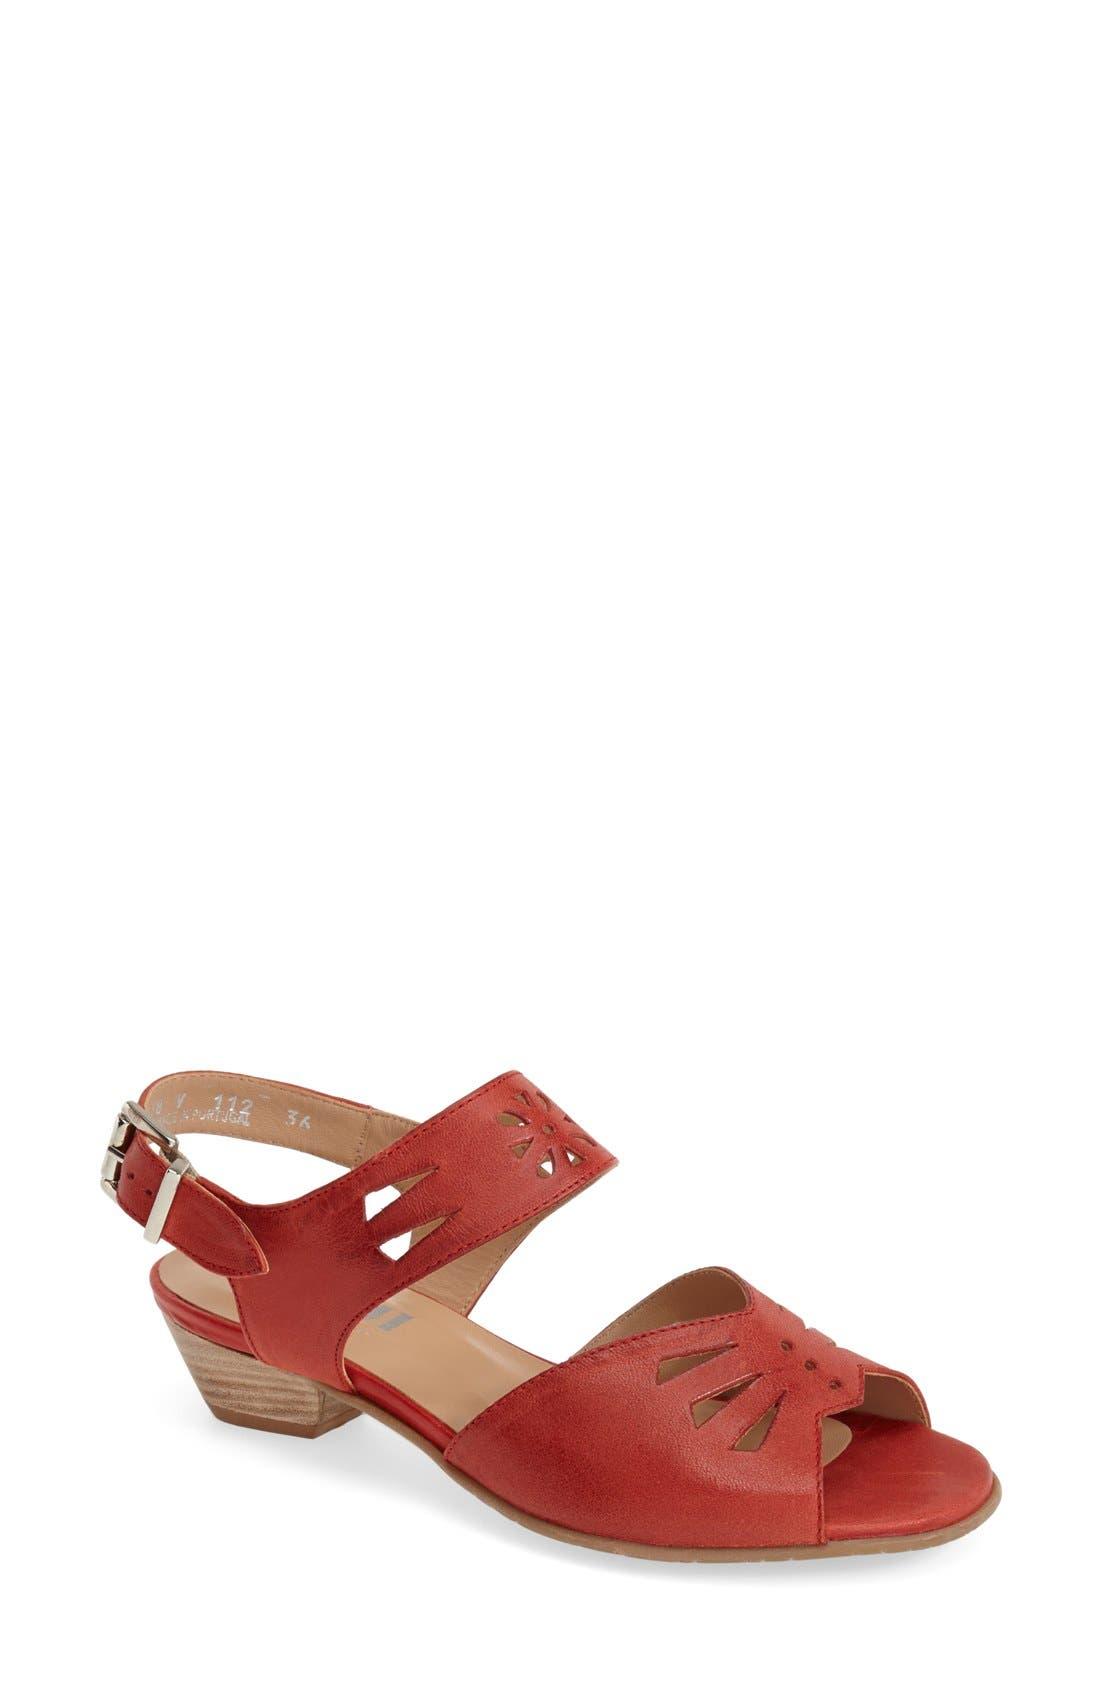 Fidji 'V112' Perforated Leather Sandal (Women)